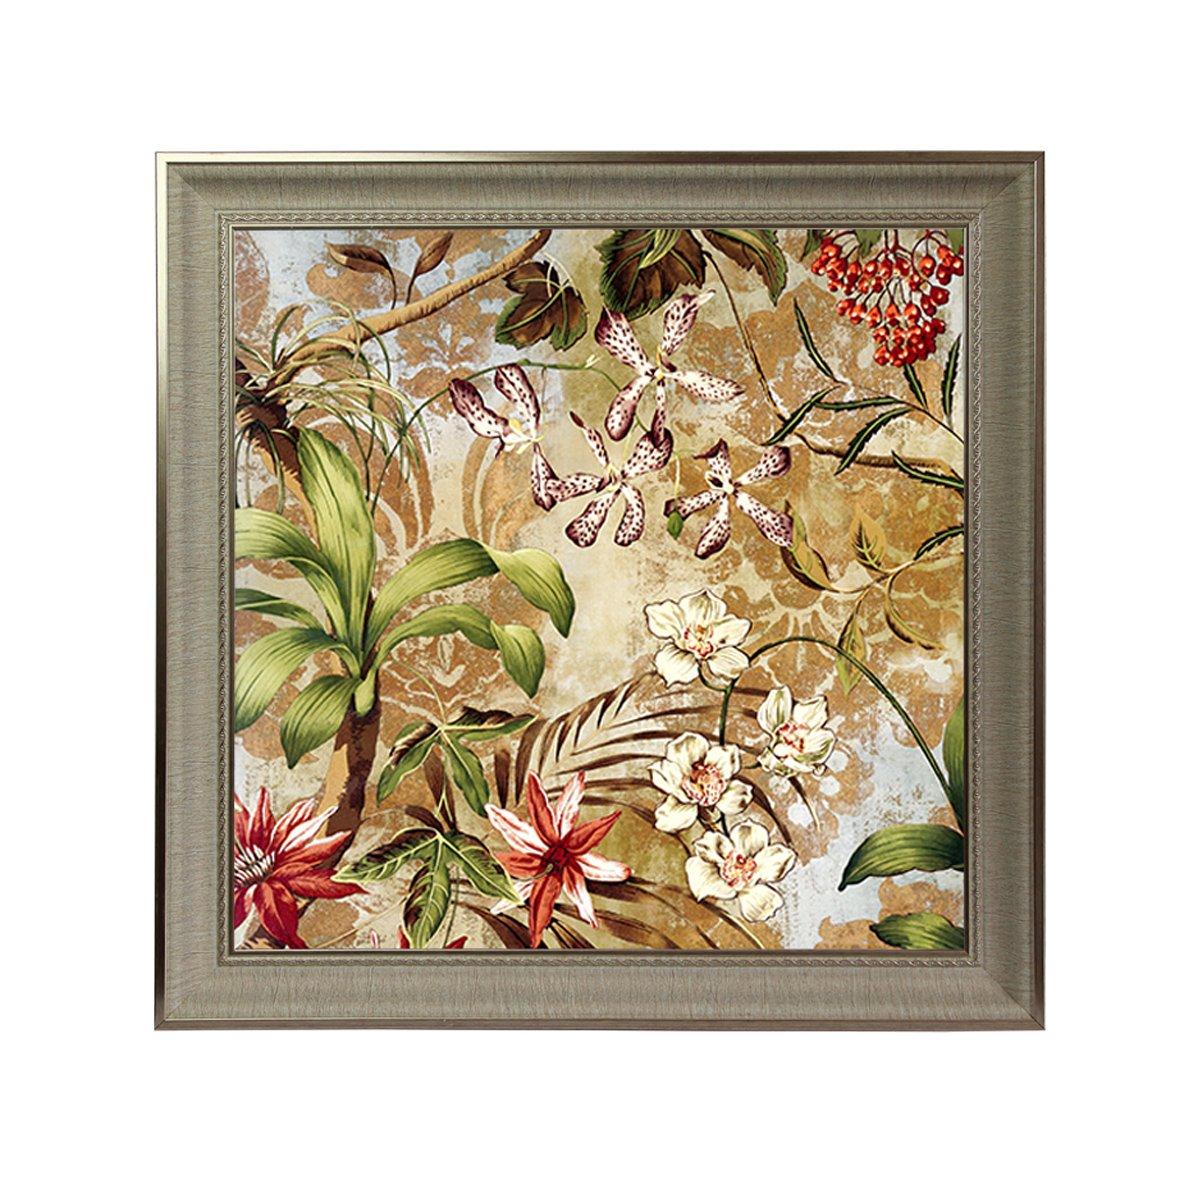 dhhd客厅卧室欧式清新花卉壁画挂画 玄关走廊两联画 欧美贵族风格装饰